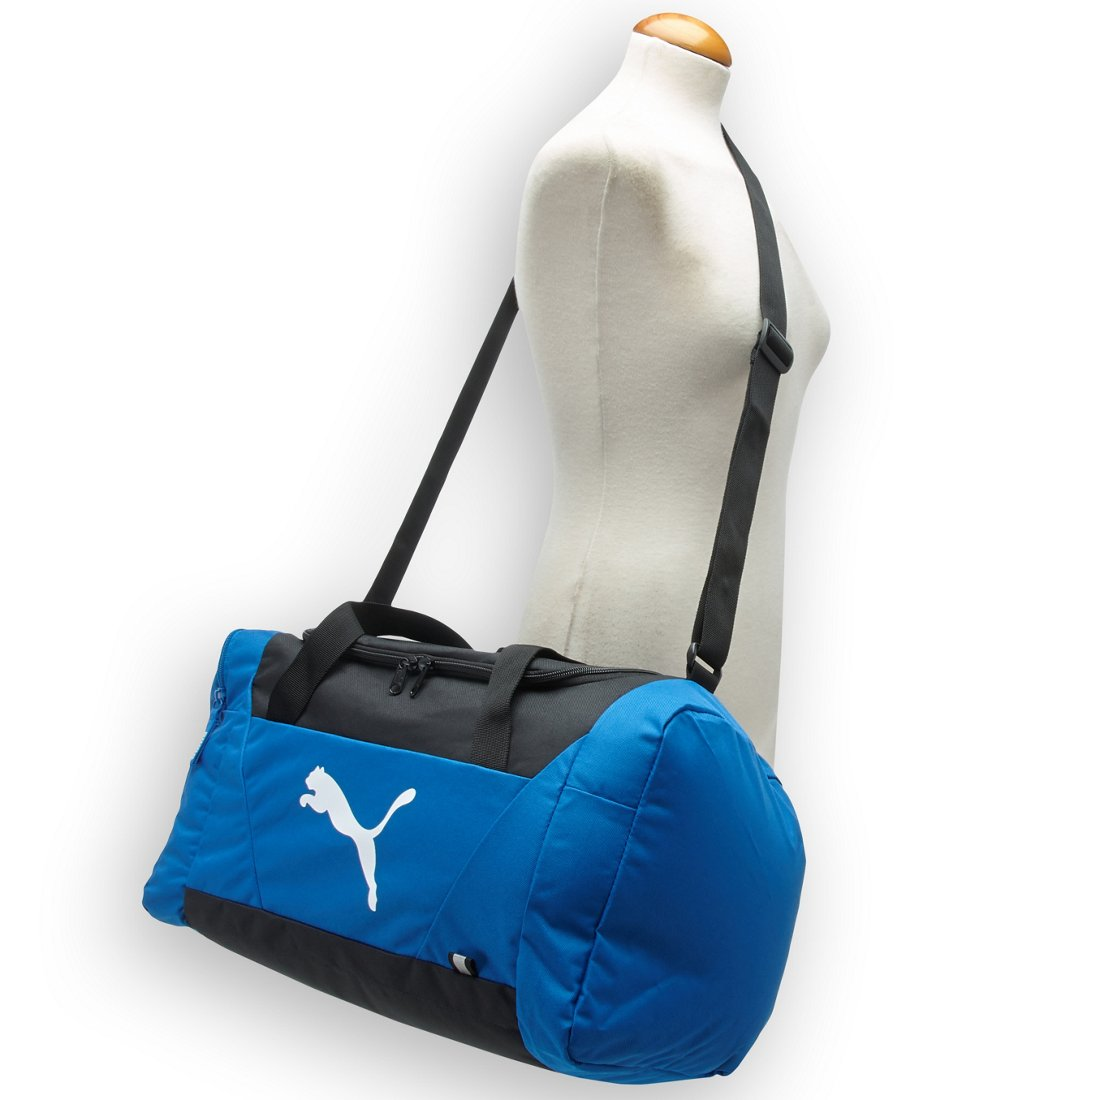 Puma Fundamentals Sports Bag Sporttasche 49 cm - koffer-direkt.de 572488afa956f